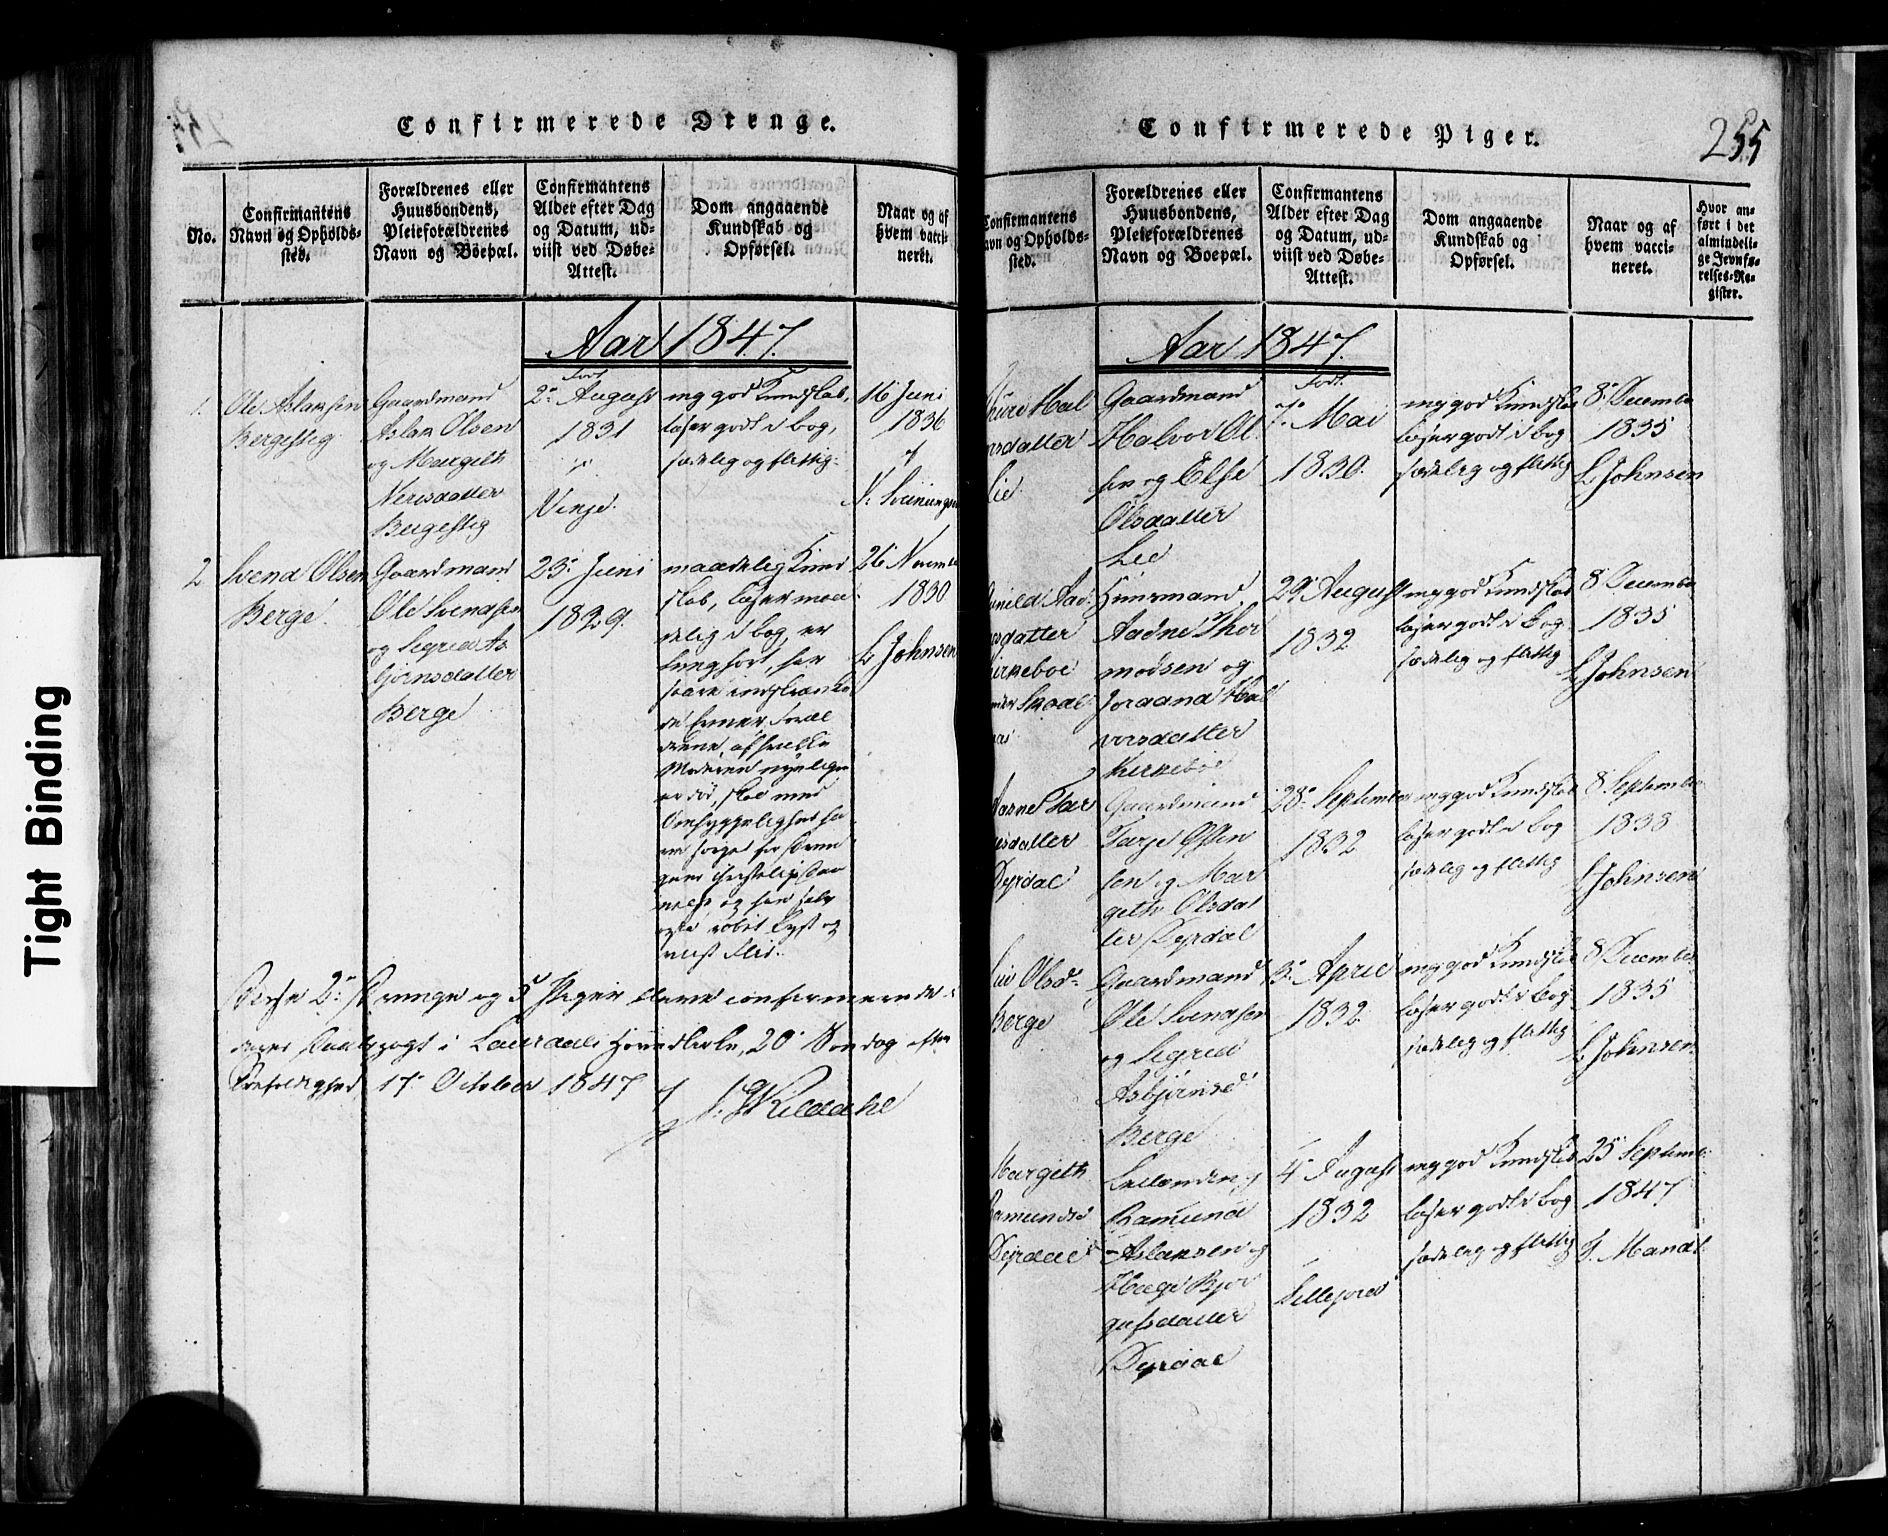 SAKO, Rauland kirkebøker, F/Fa/L0002: Ministerialbok nr. 2, 1815-1860, s. 255